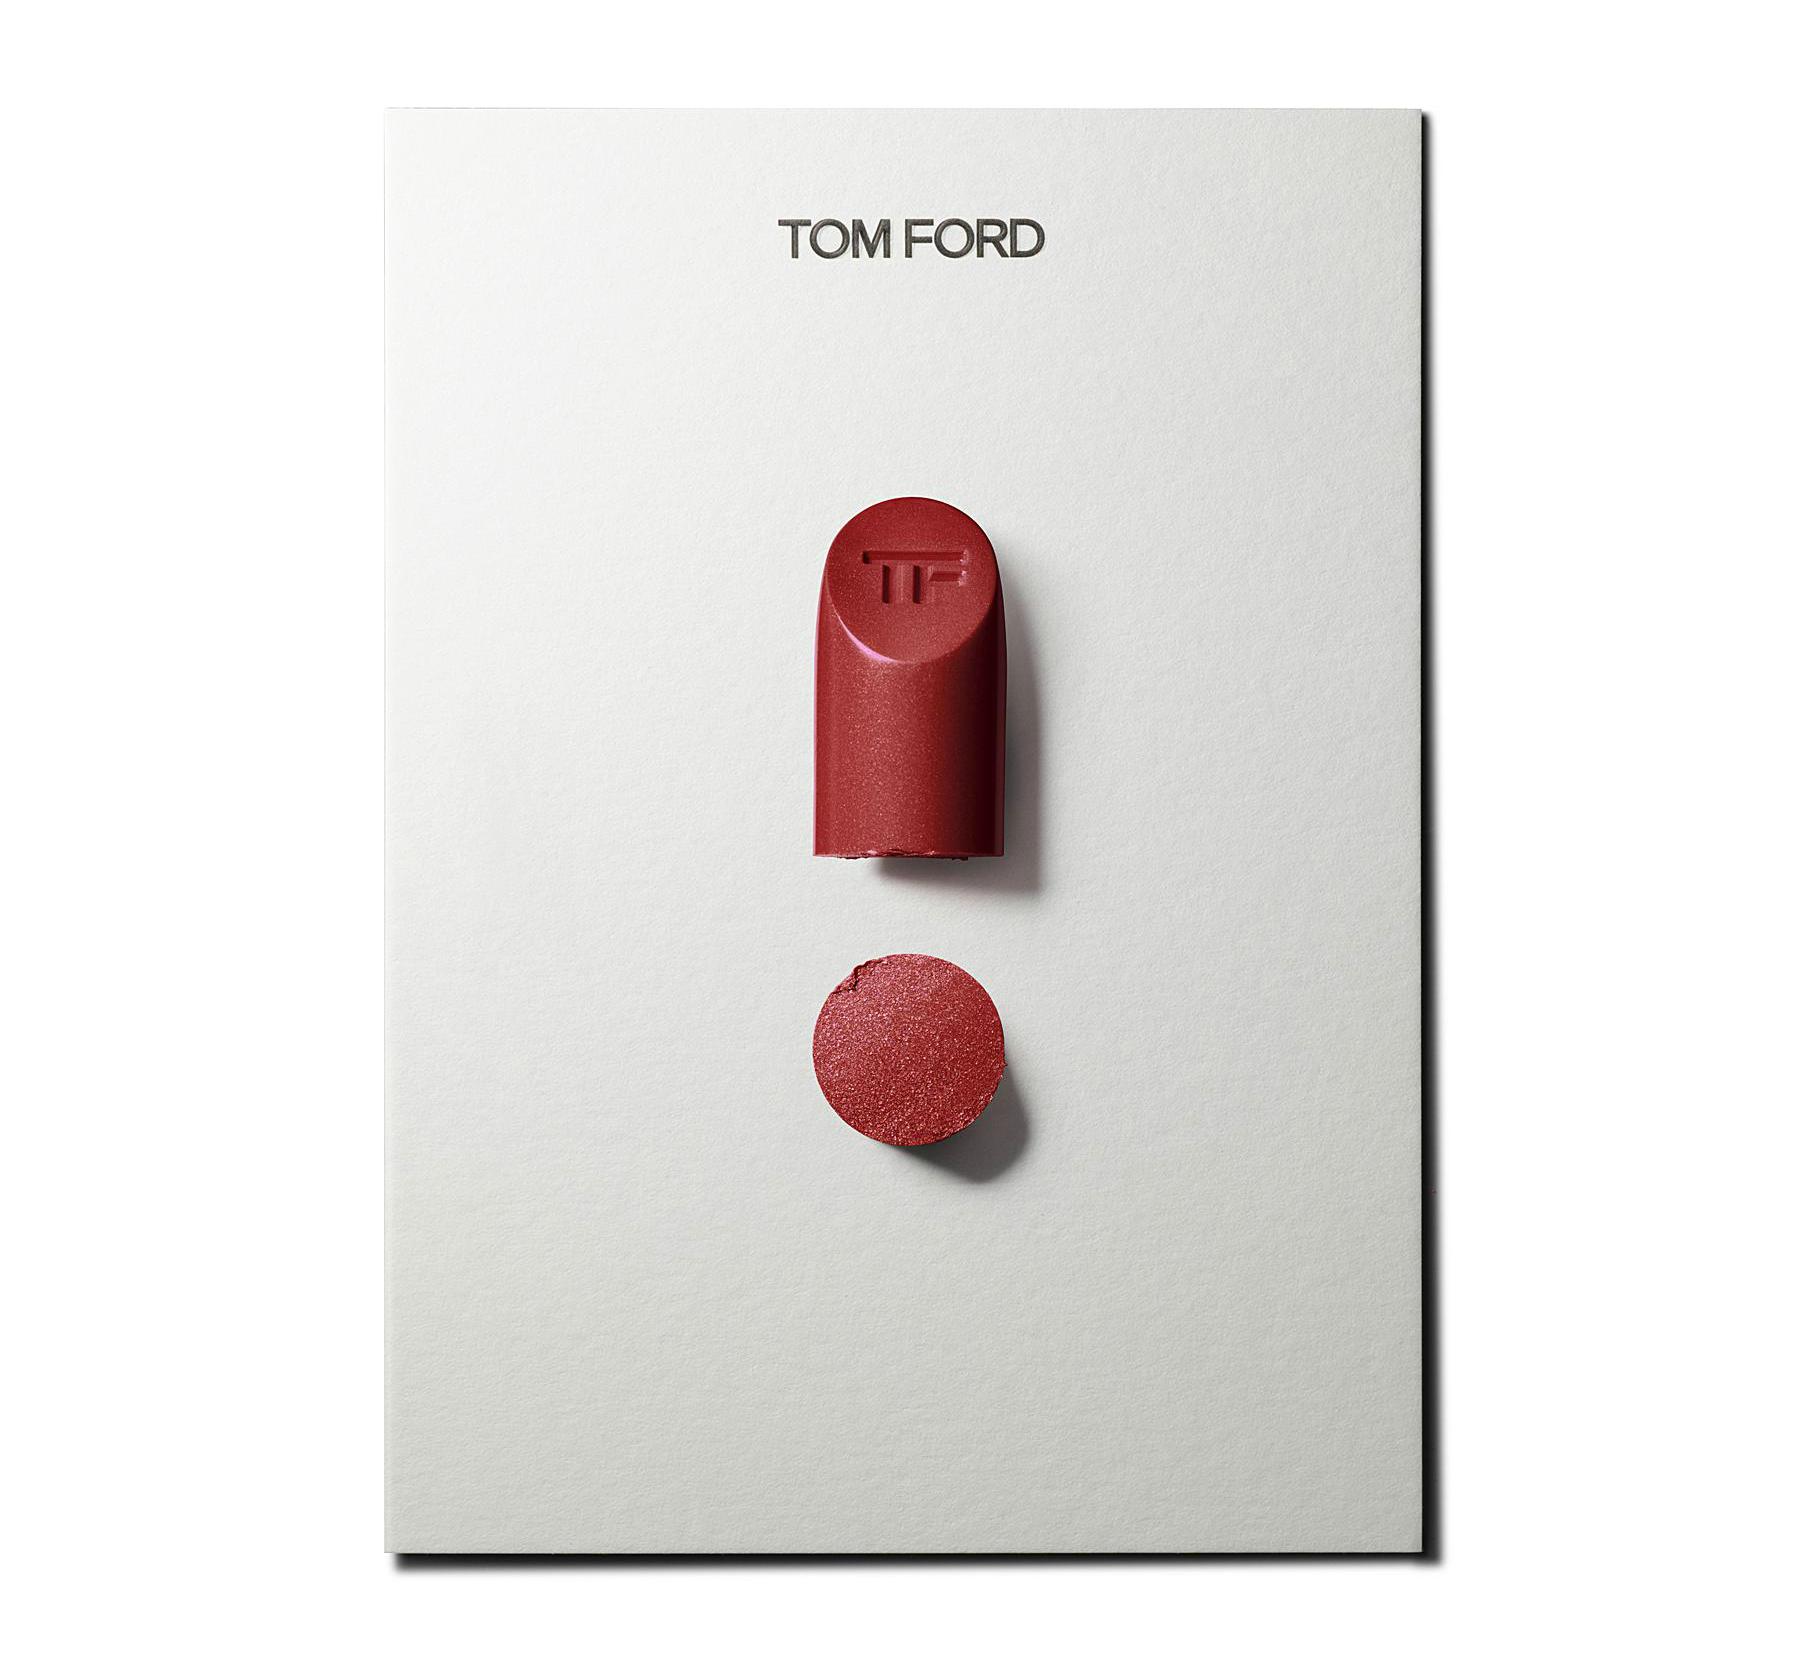 Tom Ford Limited Edition Metallic Lipstick Gift Set